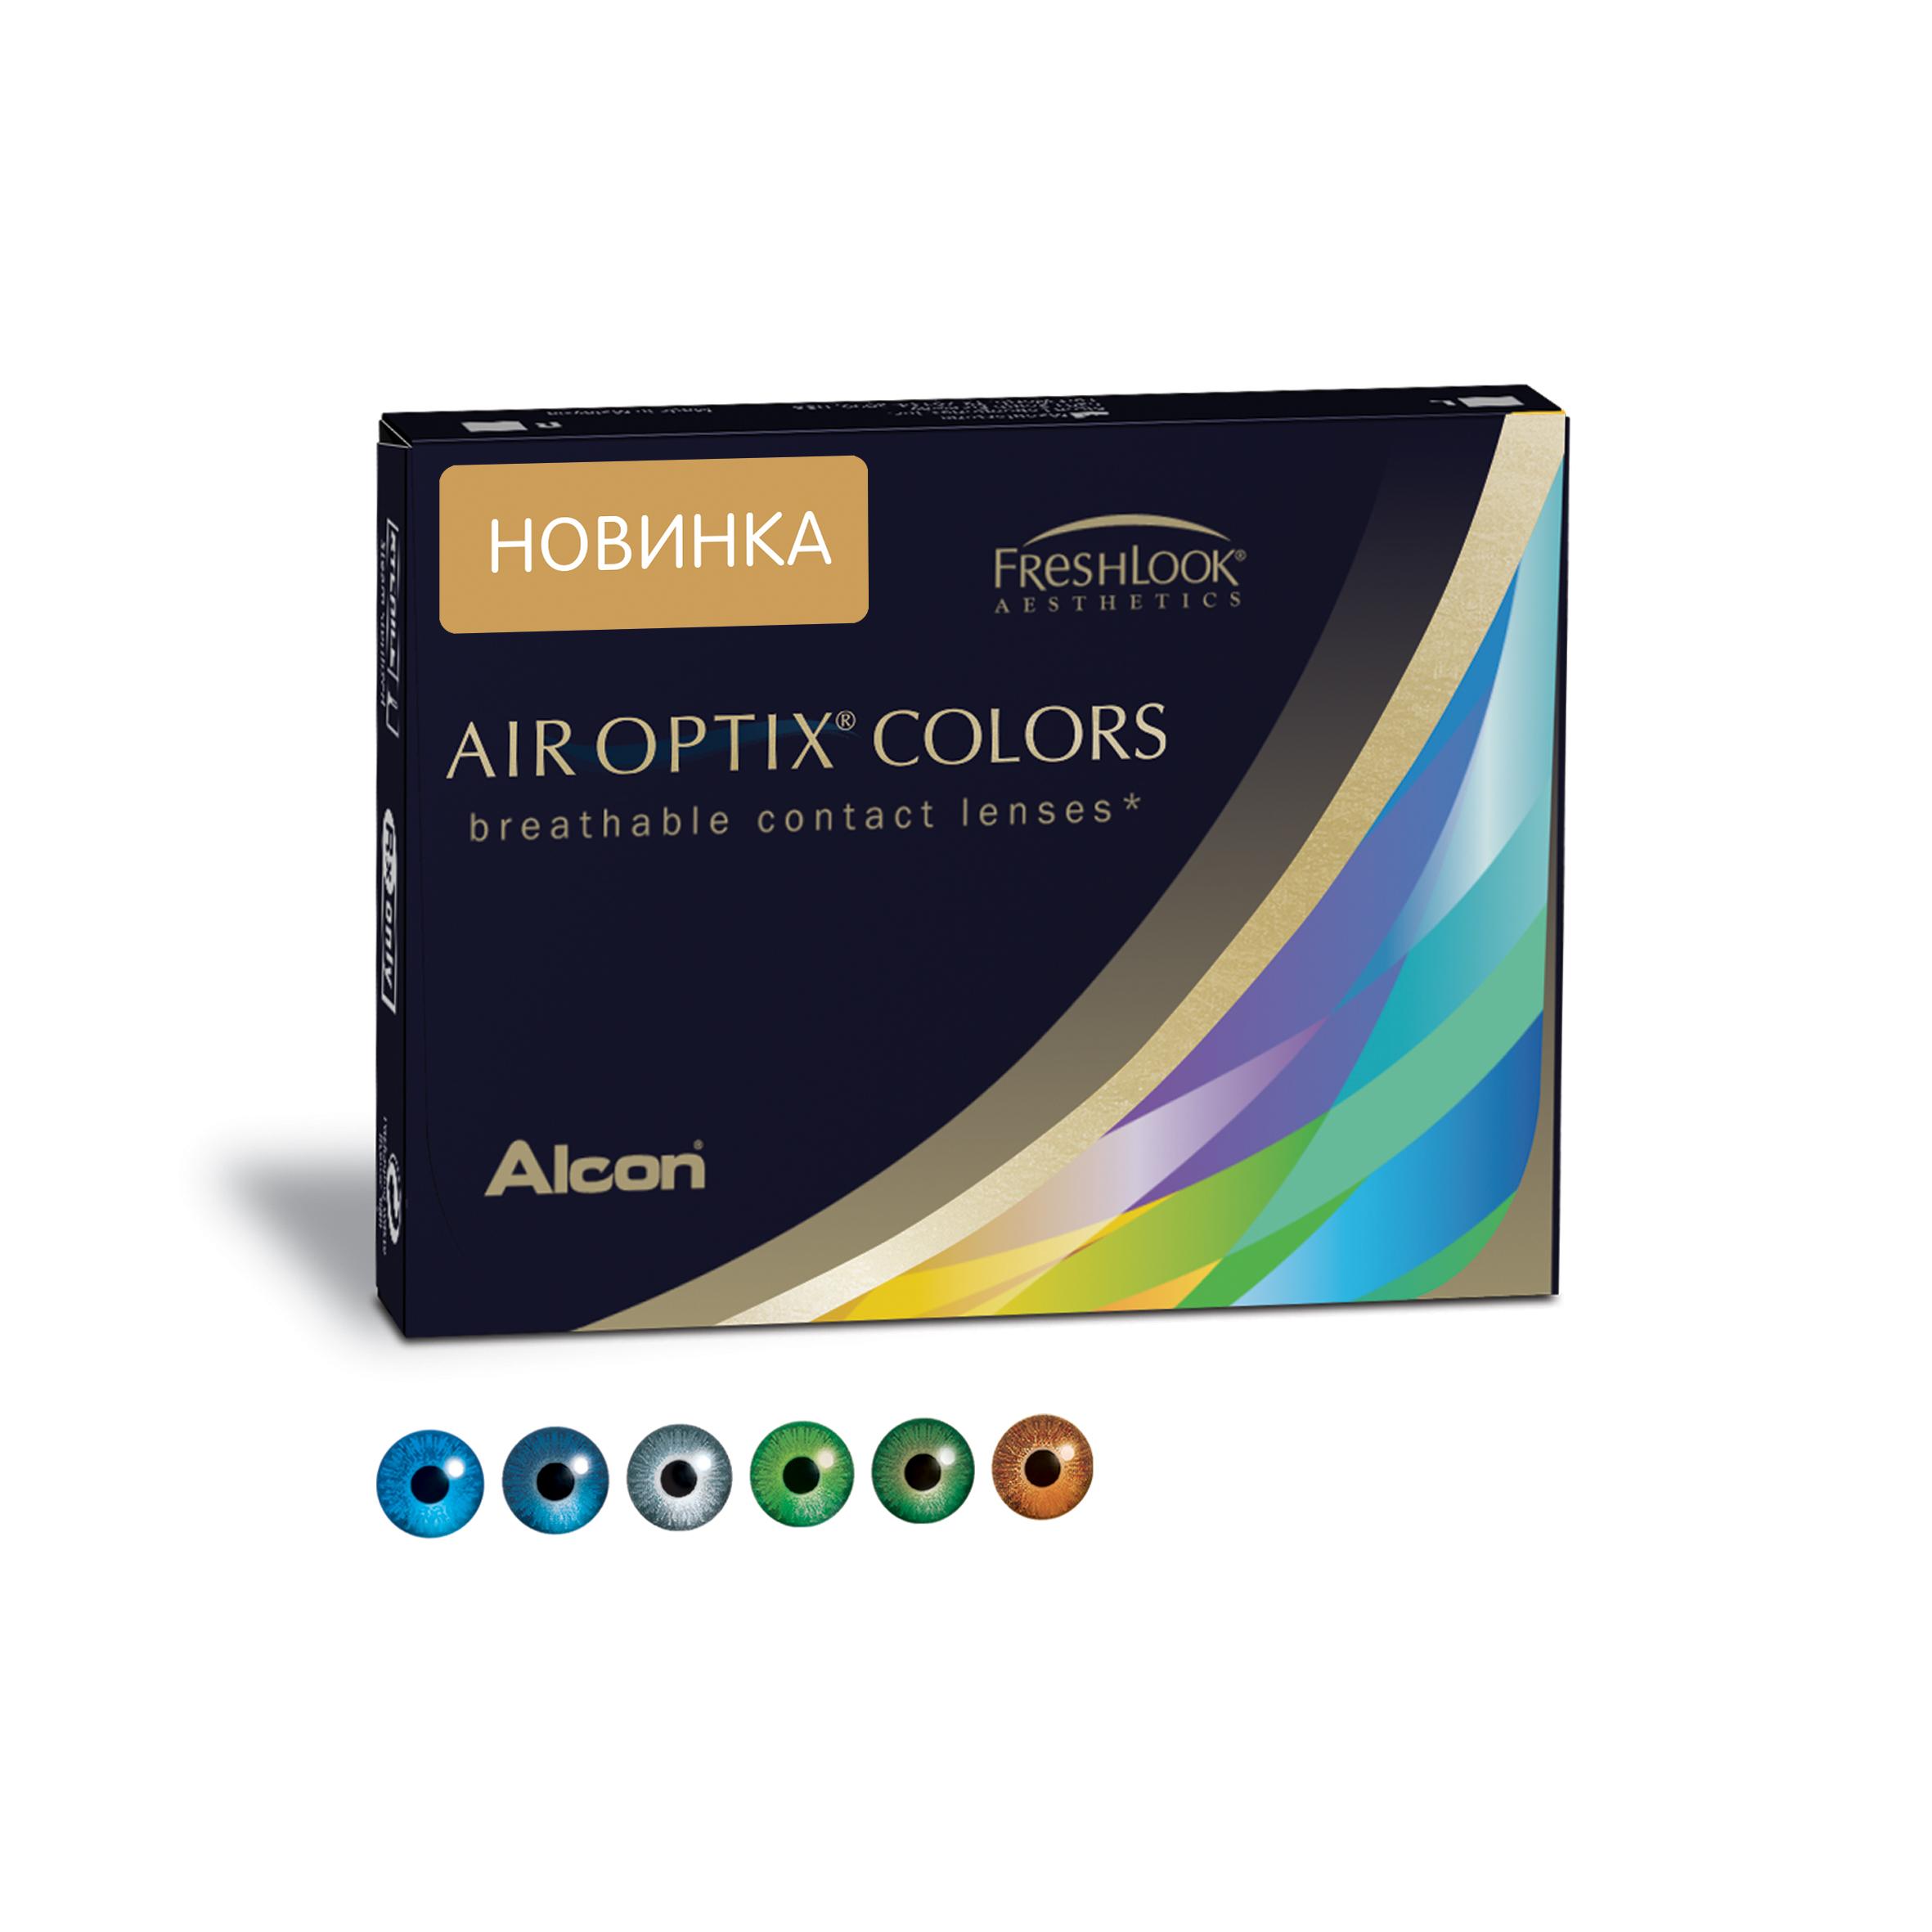 Аlcon контактные линзы Air Optix Colors 2 шт -0.75 Brilliant Blue ( 31746113 )